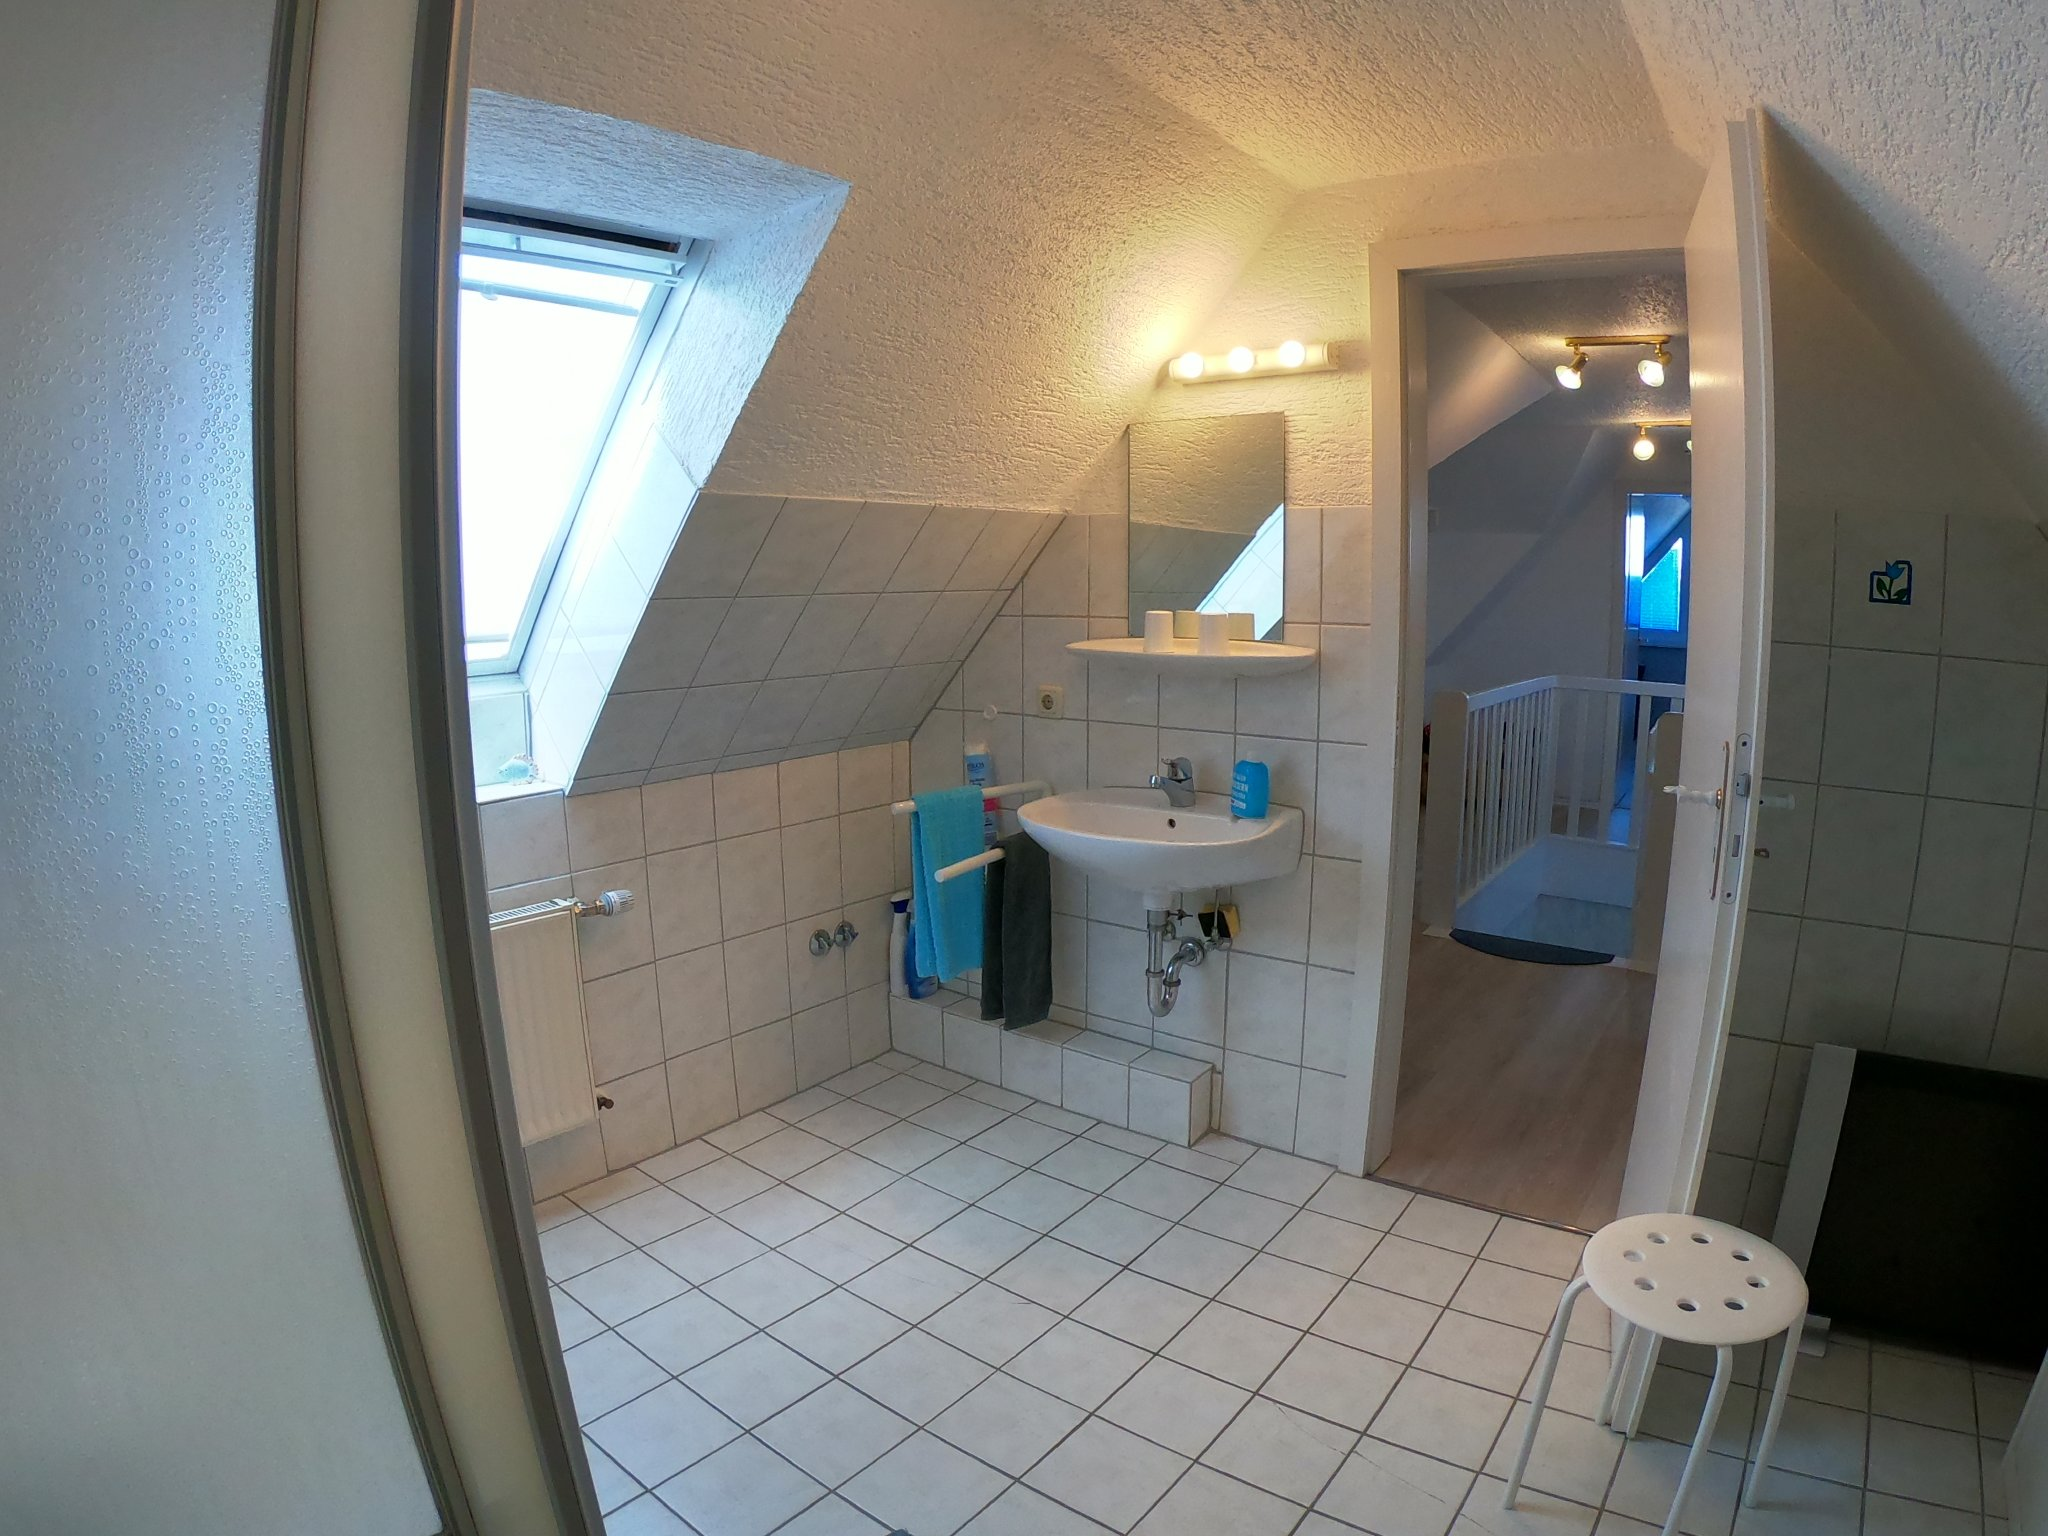 Badezimmer, Dusche, WC